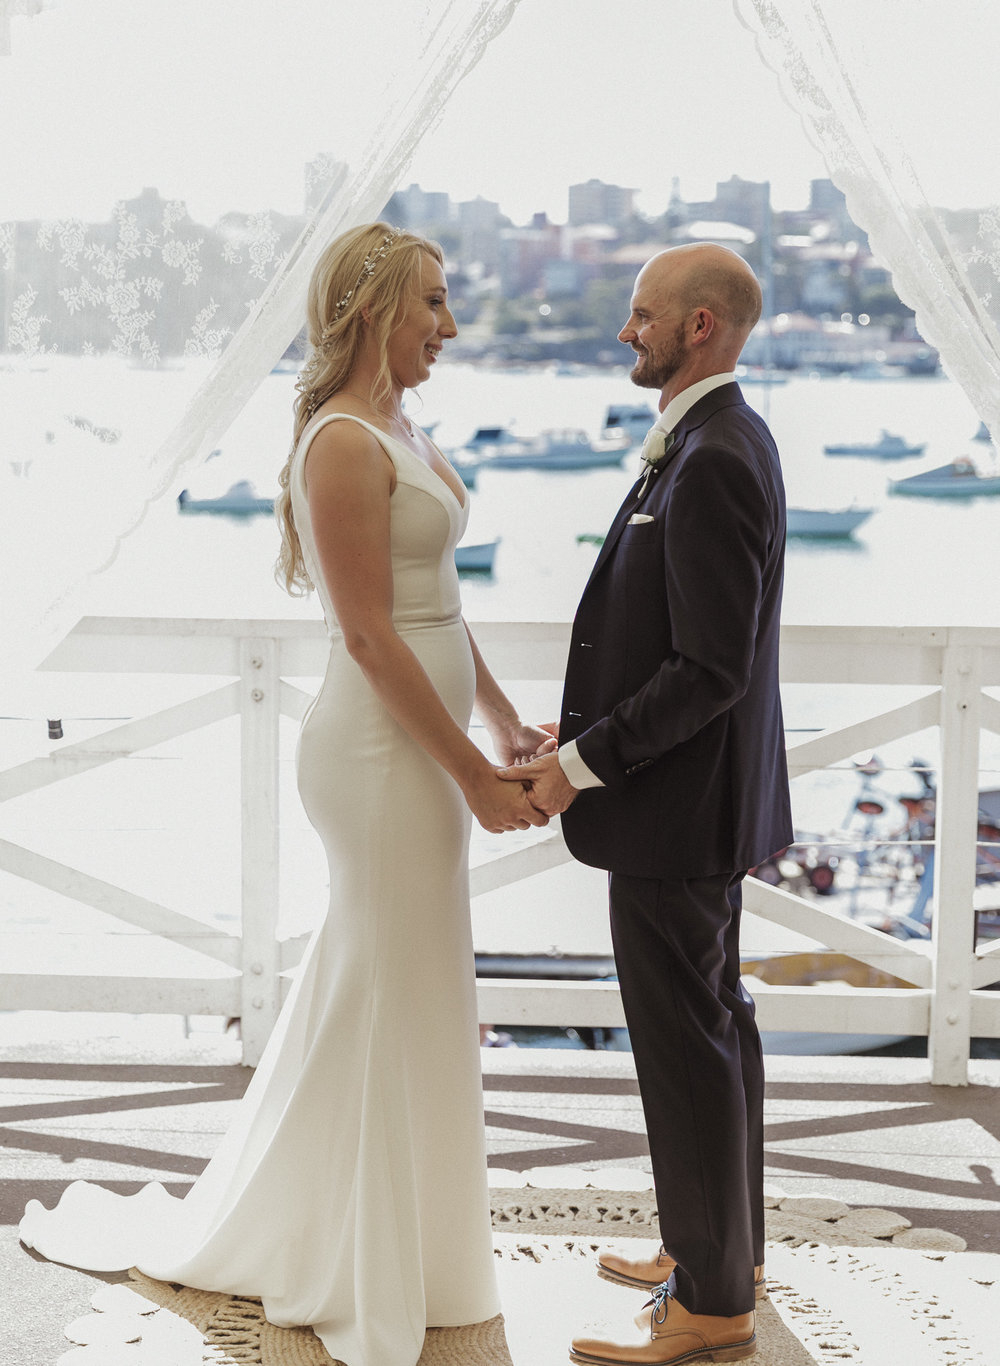 Wedding_Ceremony_Manly_Yacht_Club.jpg